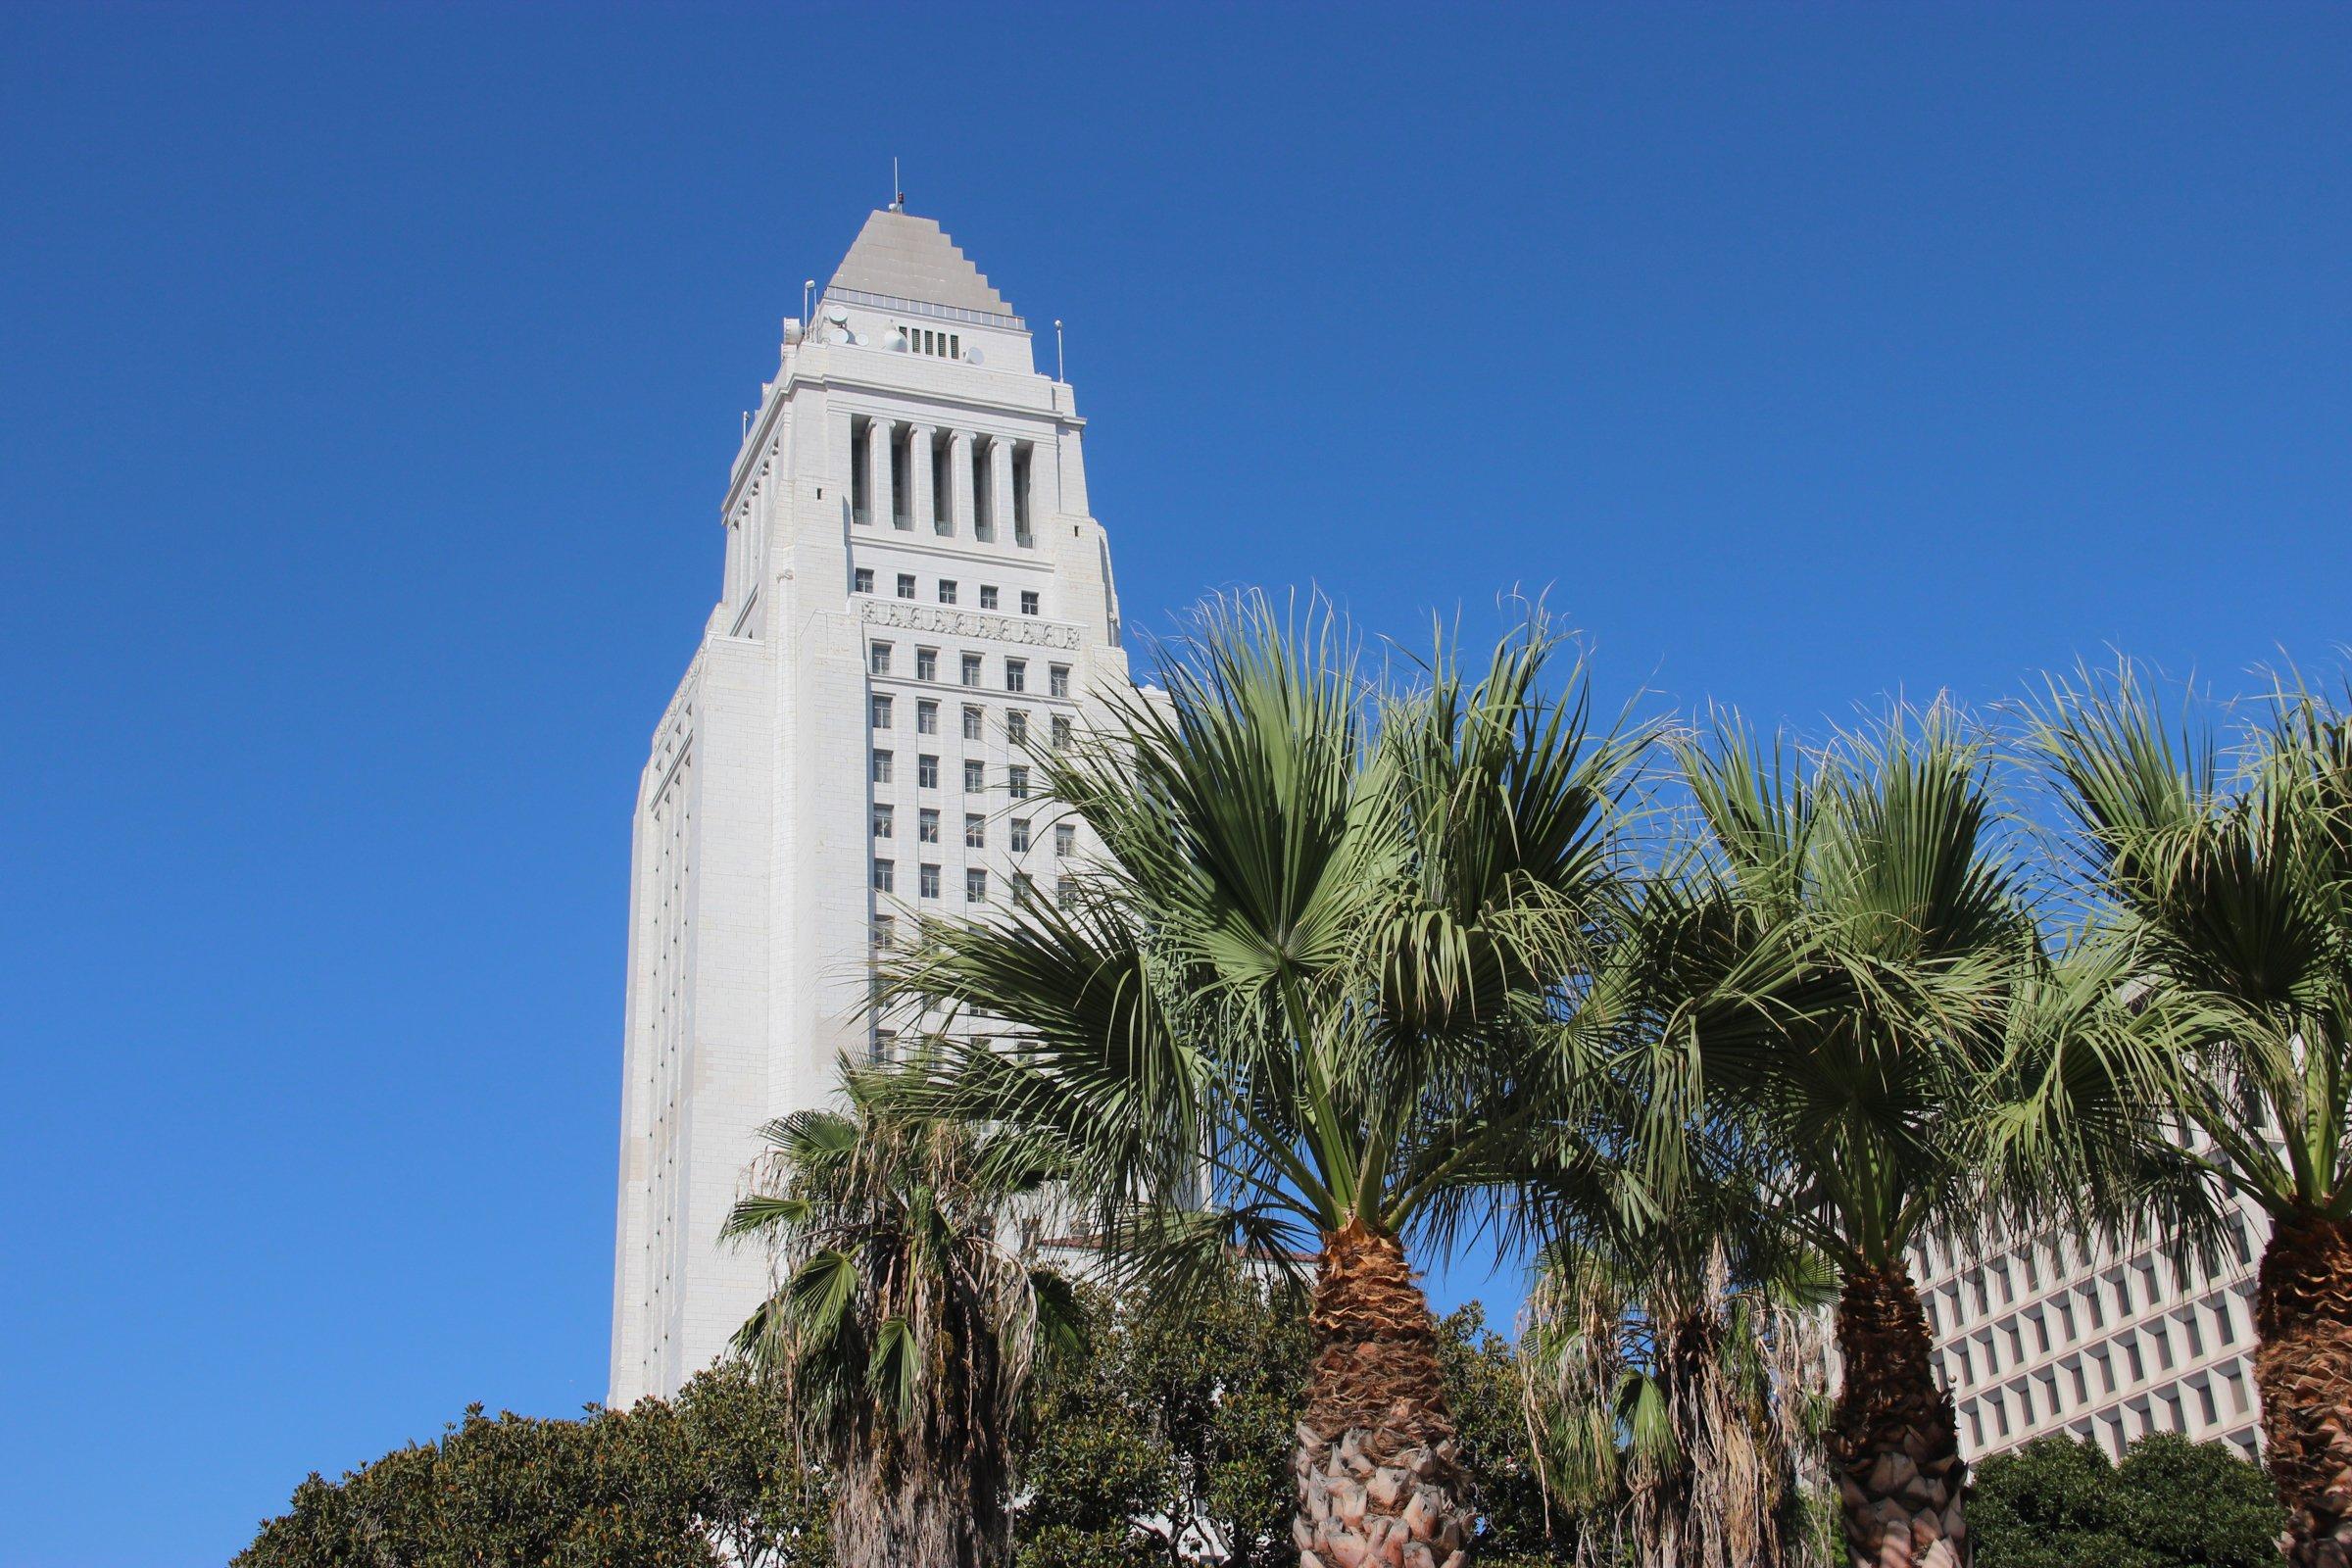 City Hall Tower Among Palm Trees